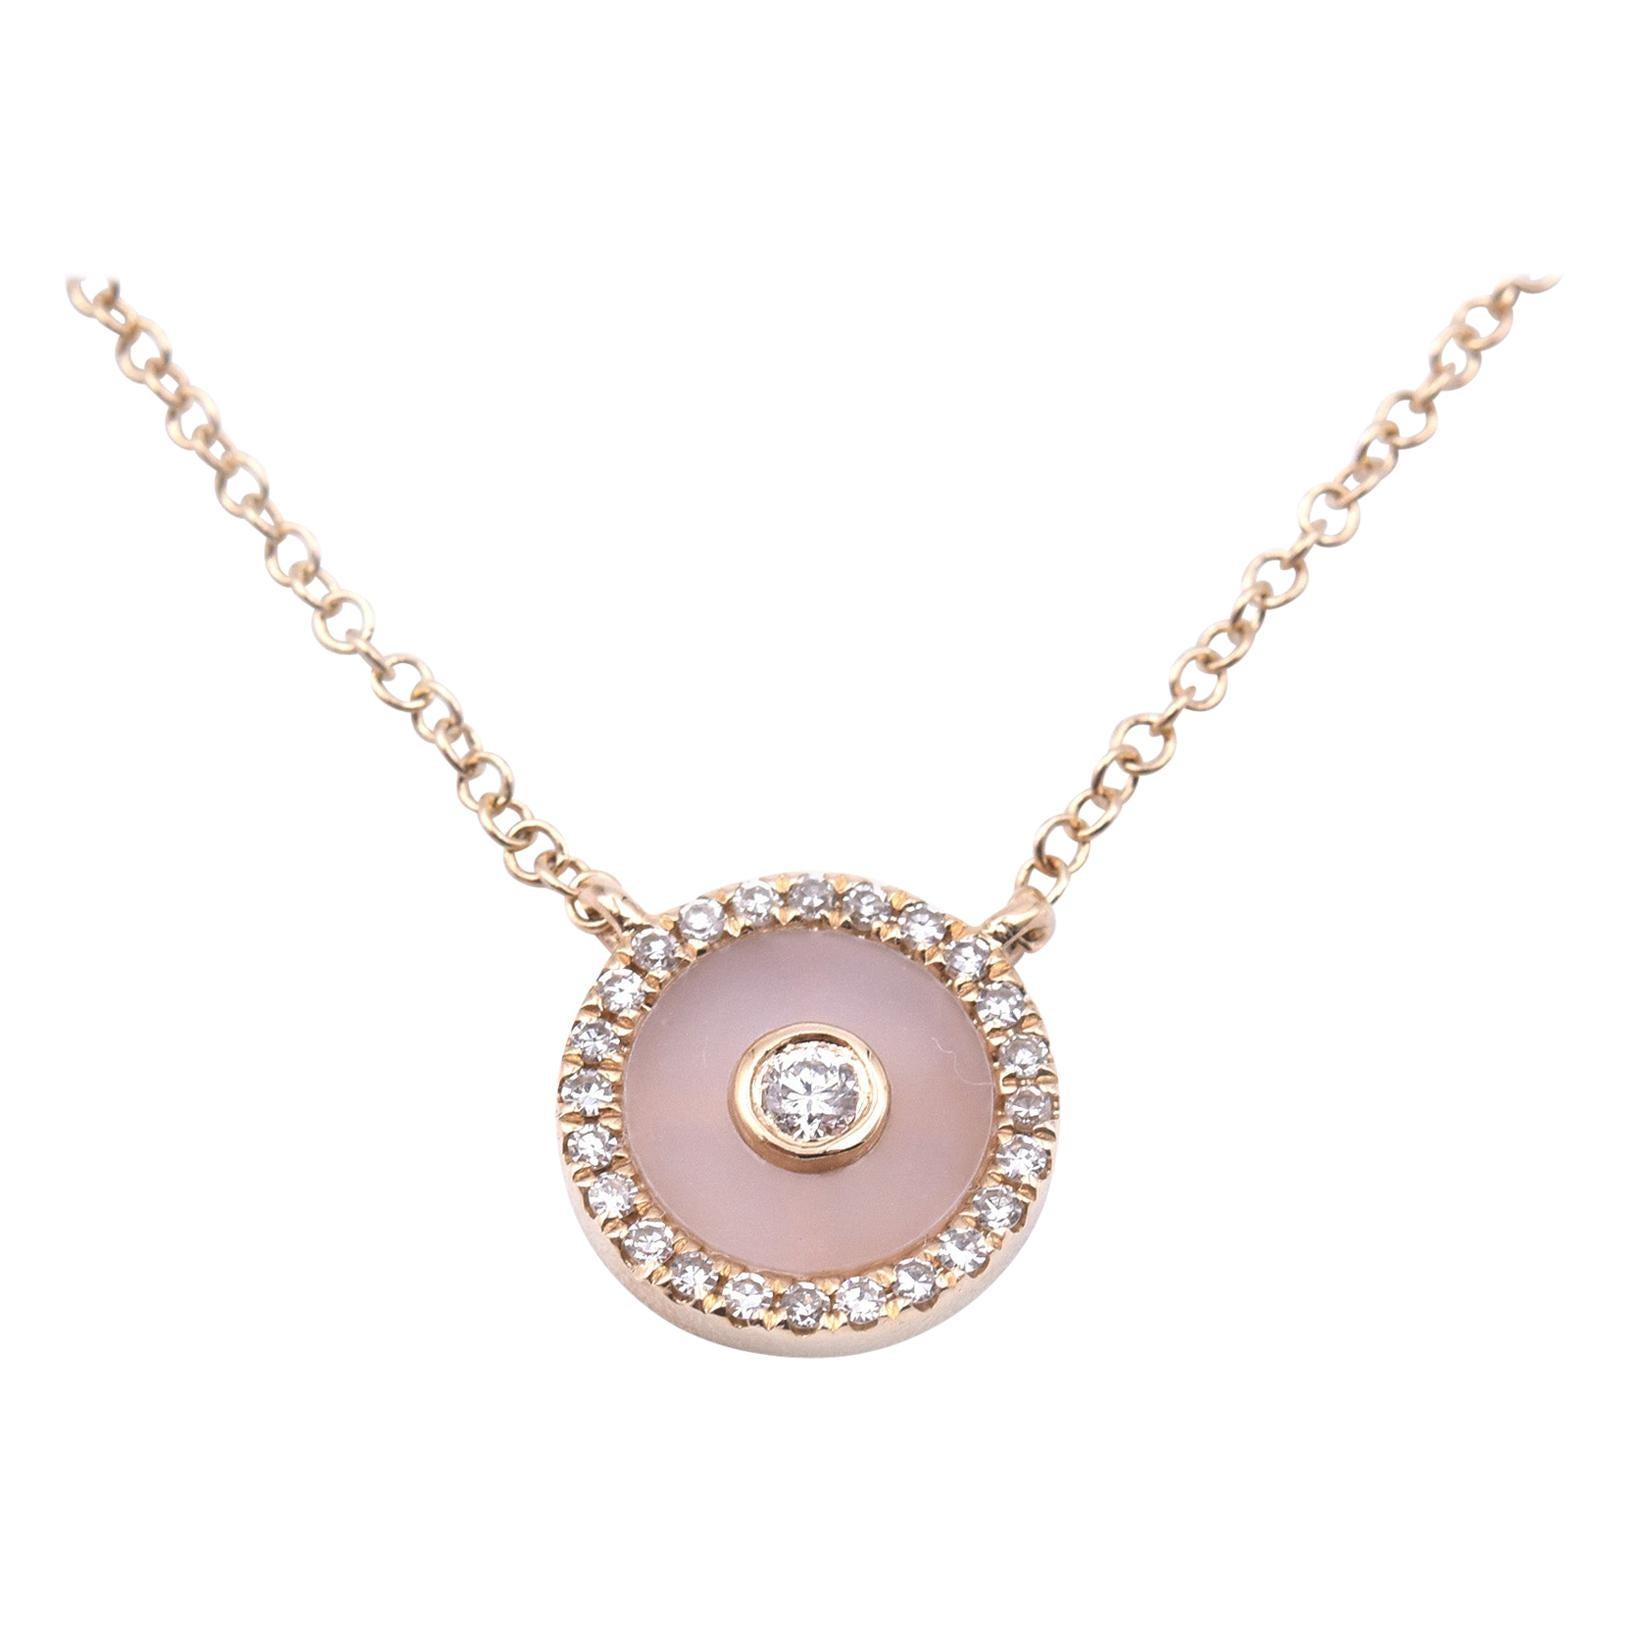 14 Karat Yellow Gold Opal and Diamond Necklace